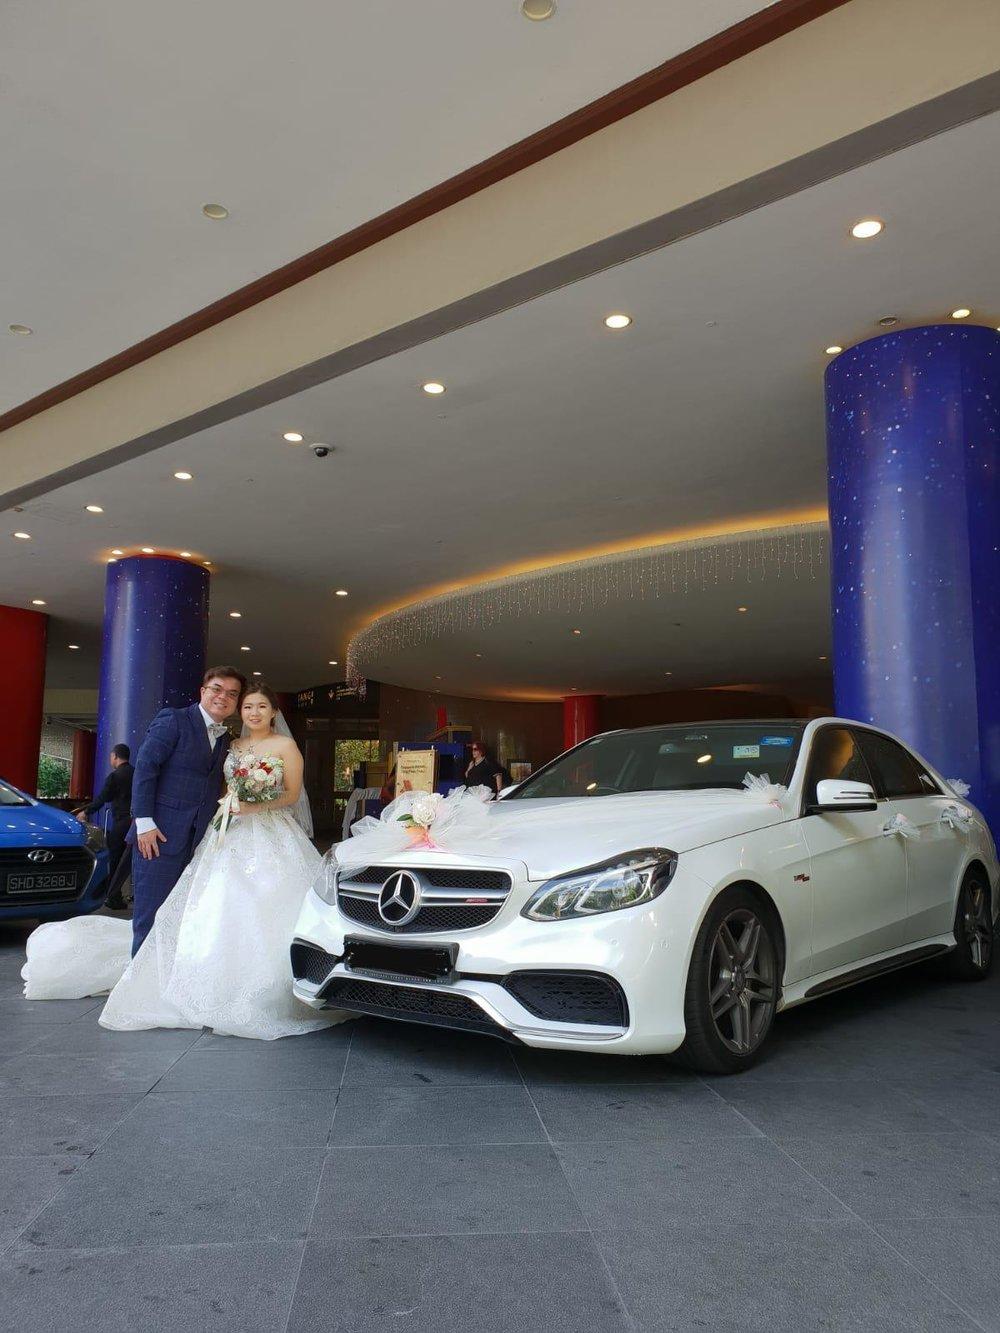 Mercedes Benz E Class Wedding Car at Orchard